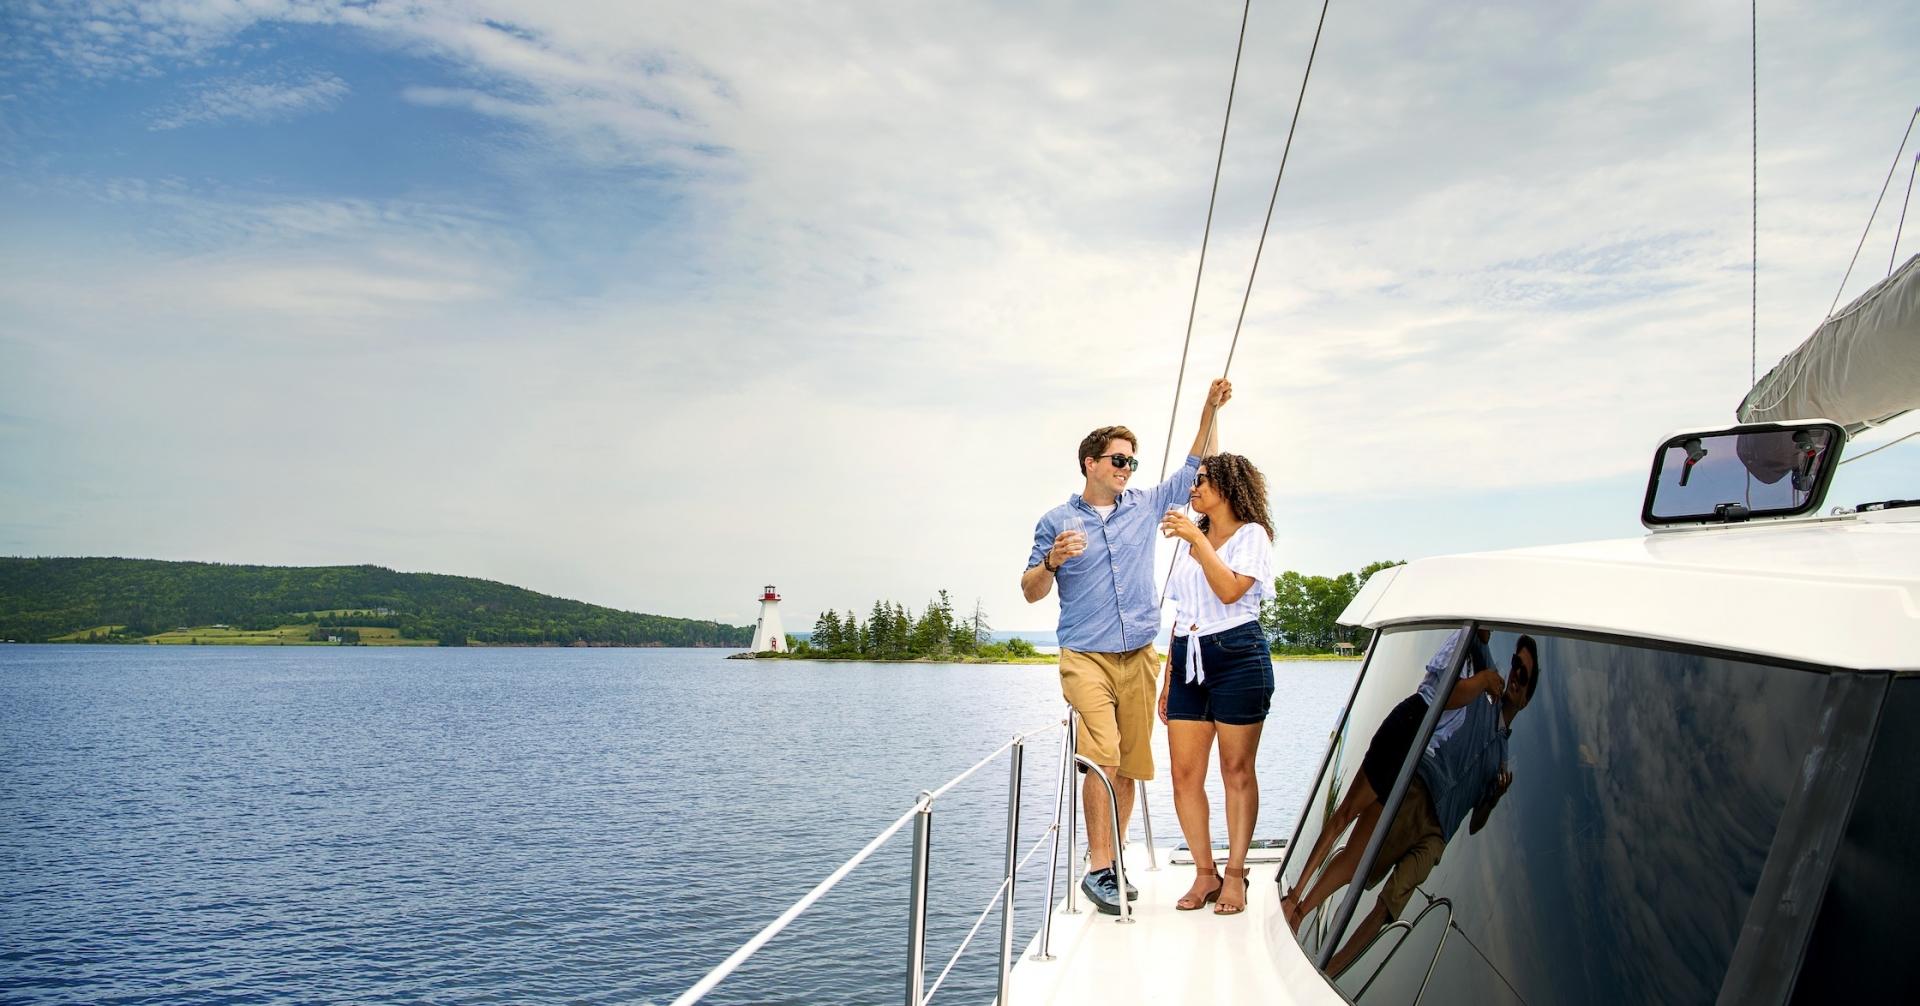 Coastal Adventure: Boating, Marinas and Wildlife 3